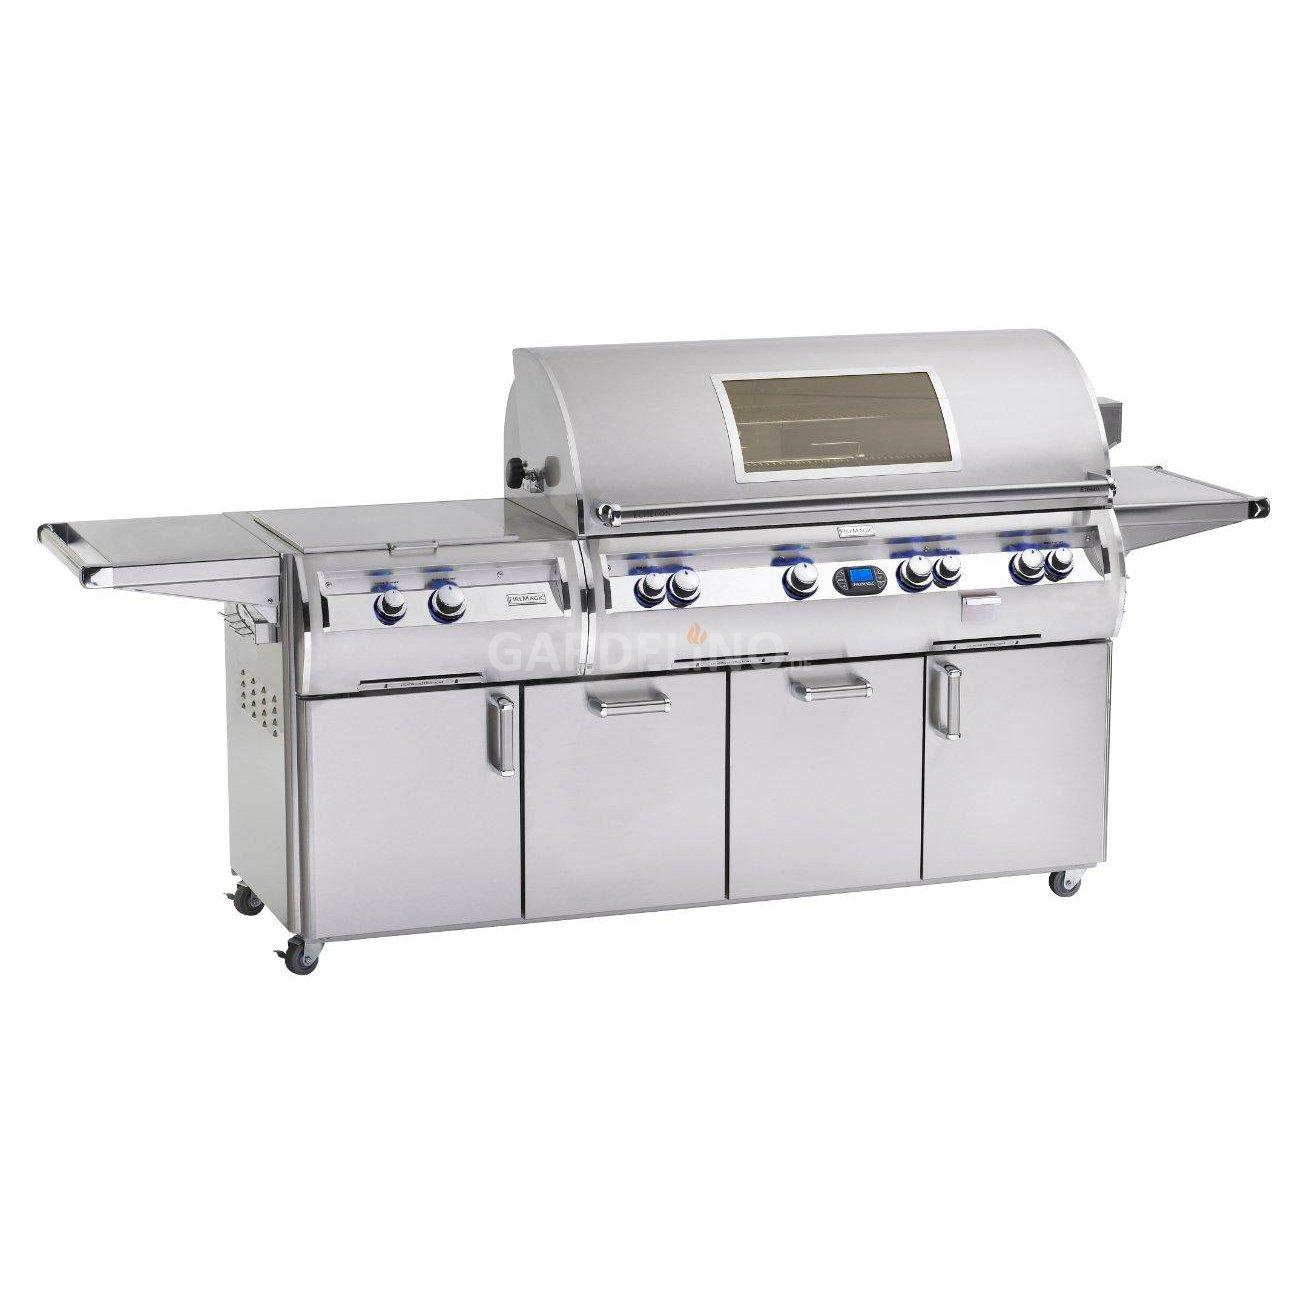 Bull Outdoor Kitchen Luxus Gasgrill Station Fire Magic Echelon E1060s